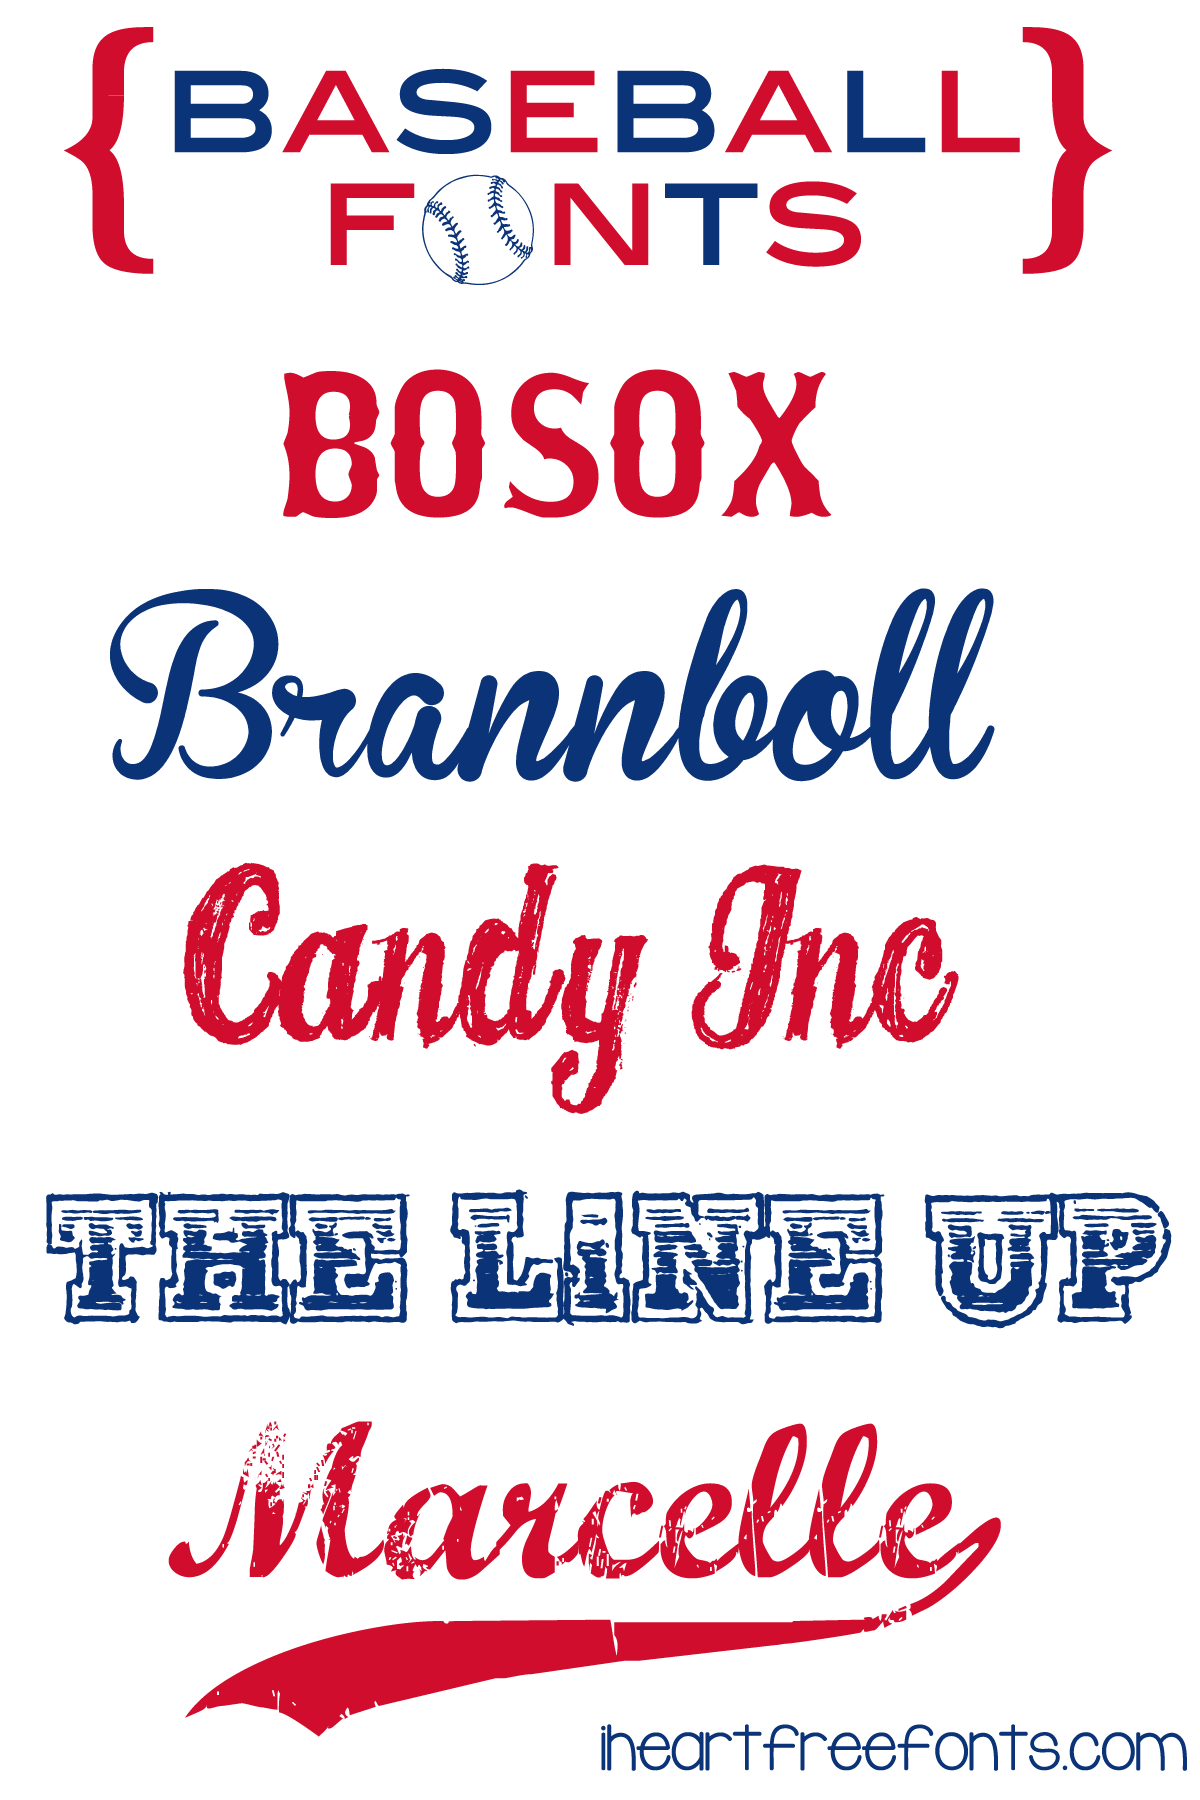 Baseball fonts | cricut fun | Baseball font, Silhouette fonts